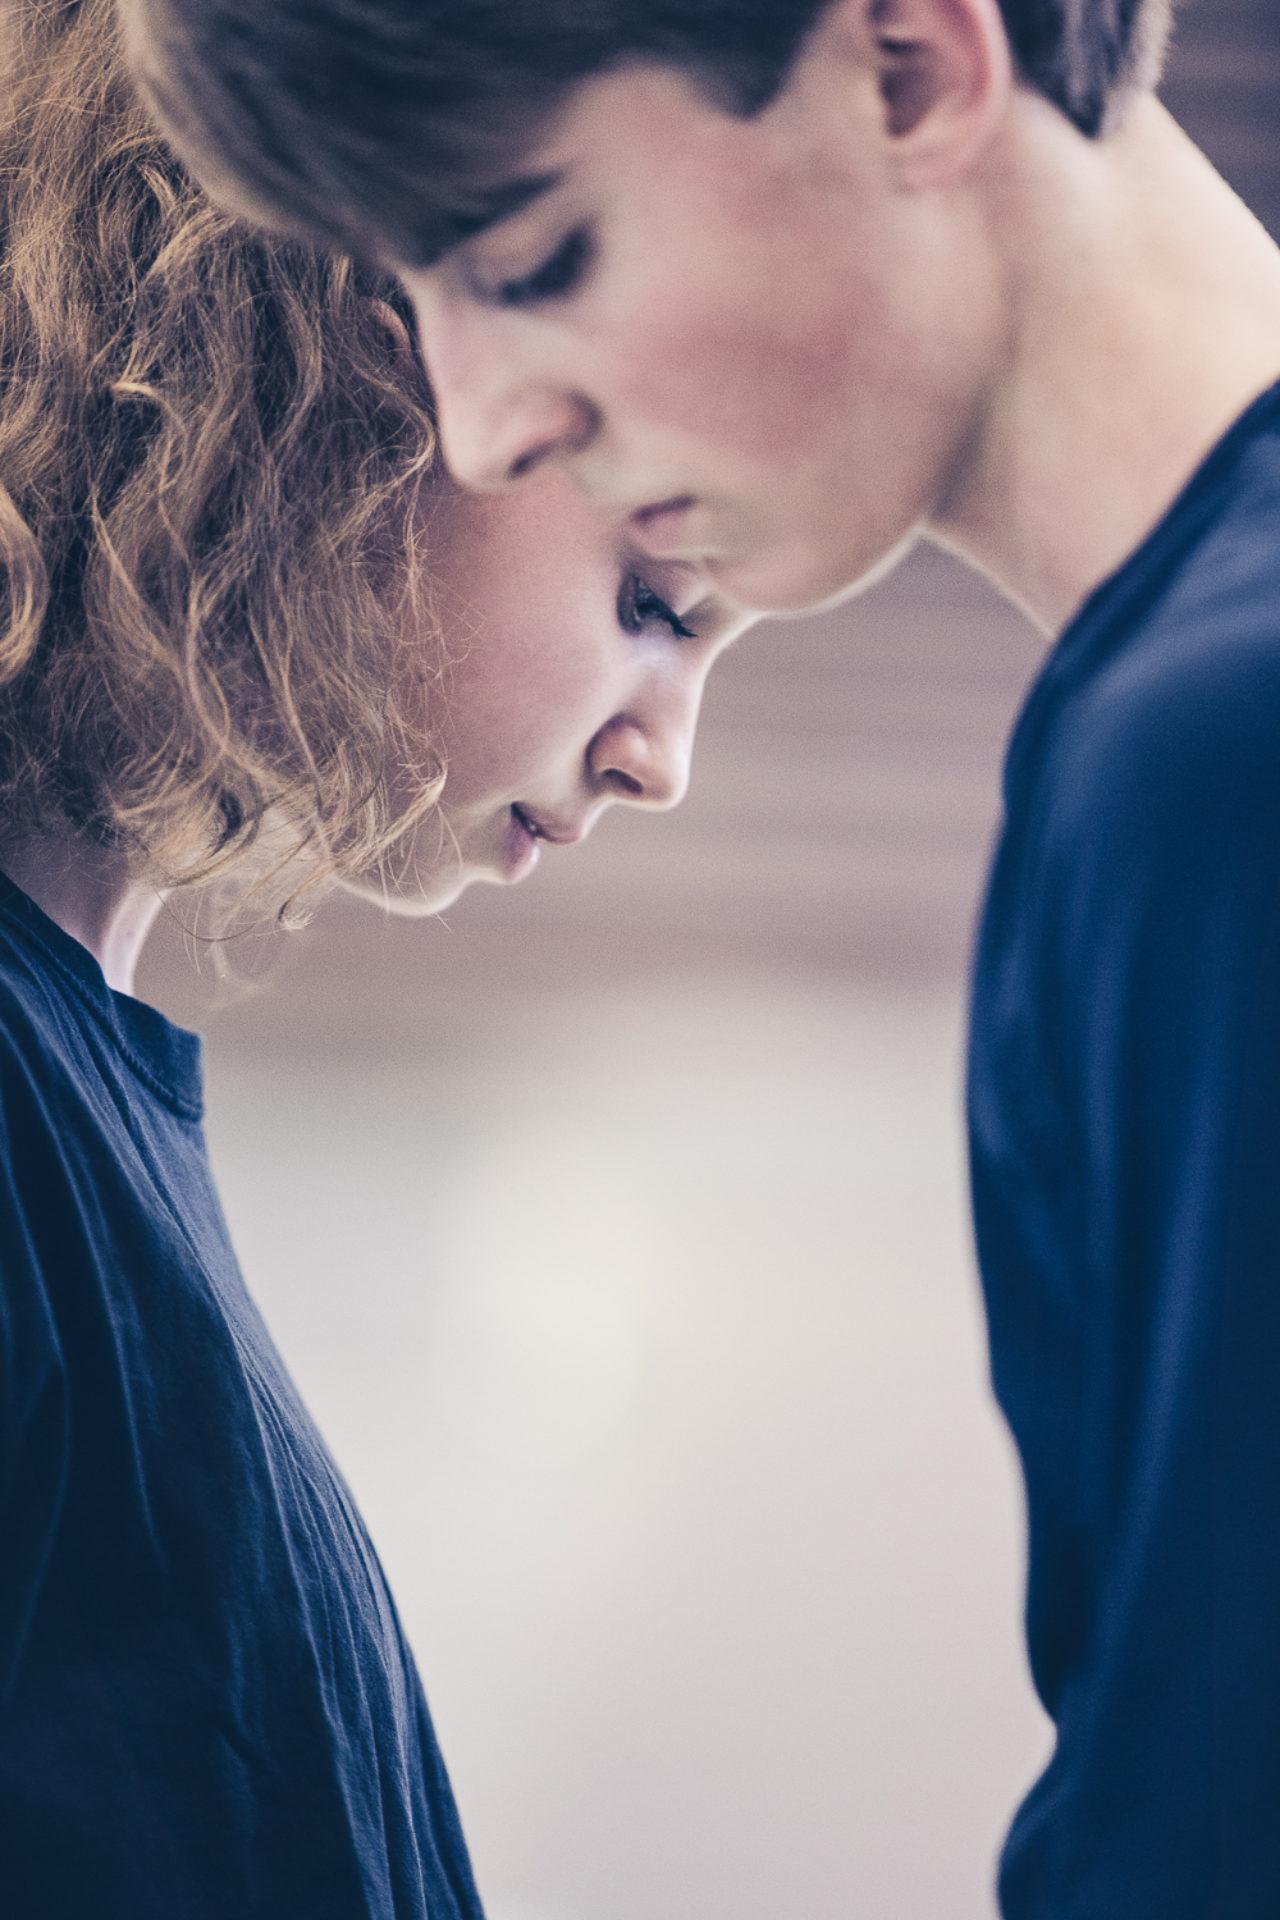 Radio hiili ajoitus dating dokumentti